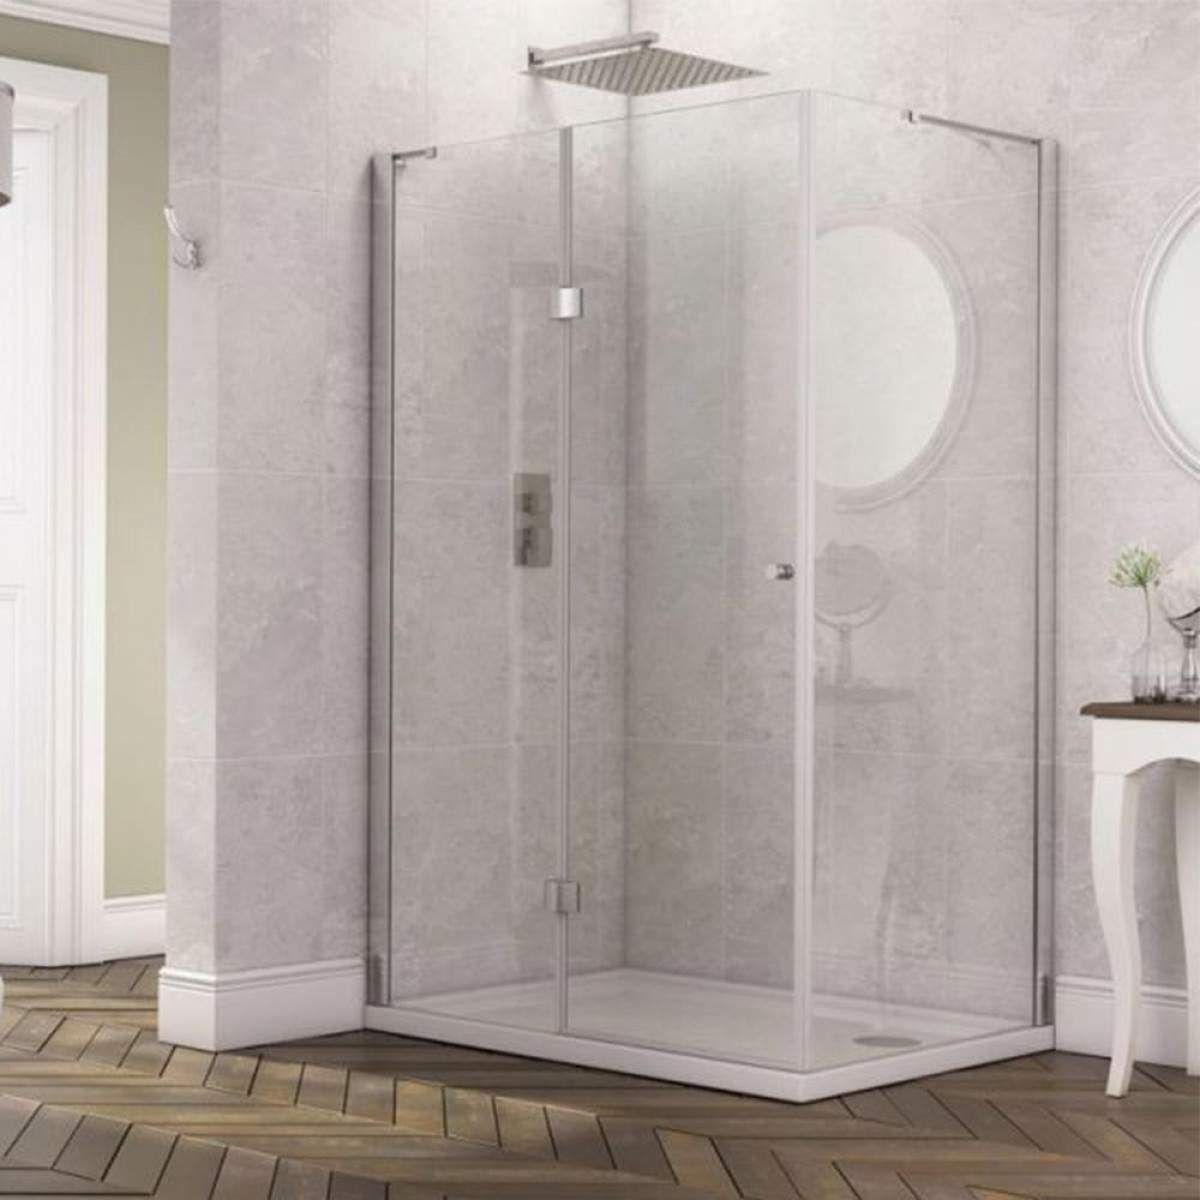 Imaginative Frameless Hinged Shower Enclosure Design Ideas